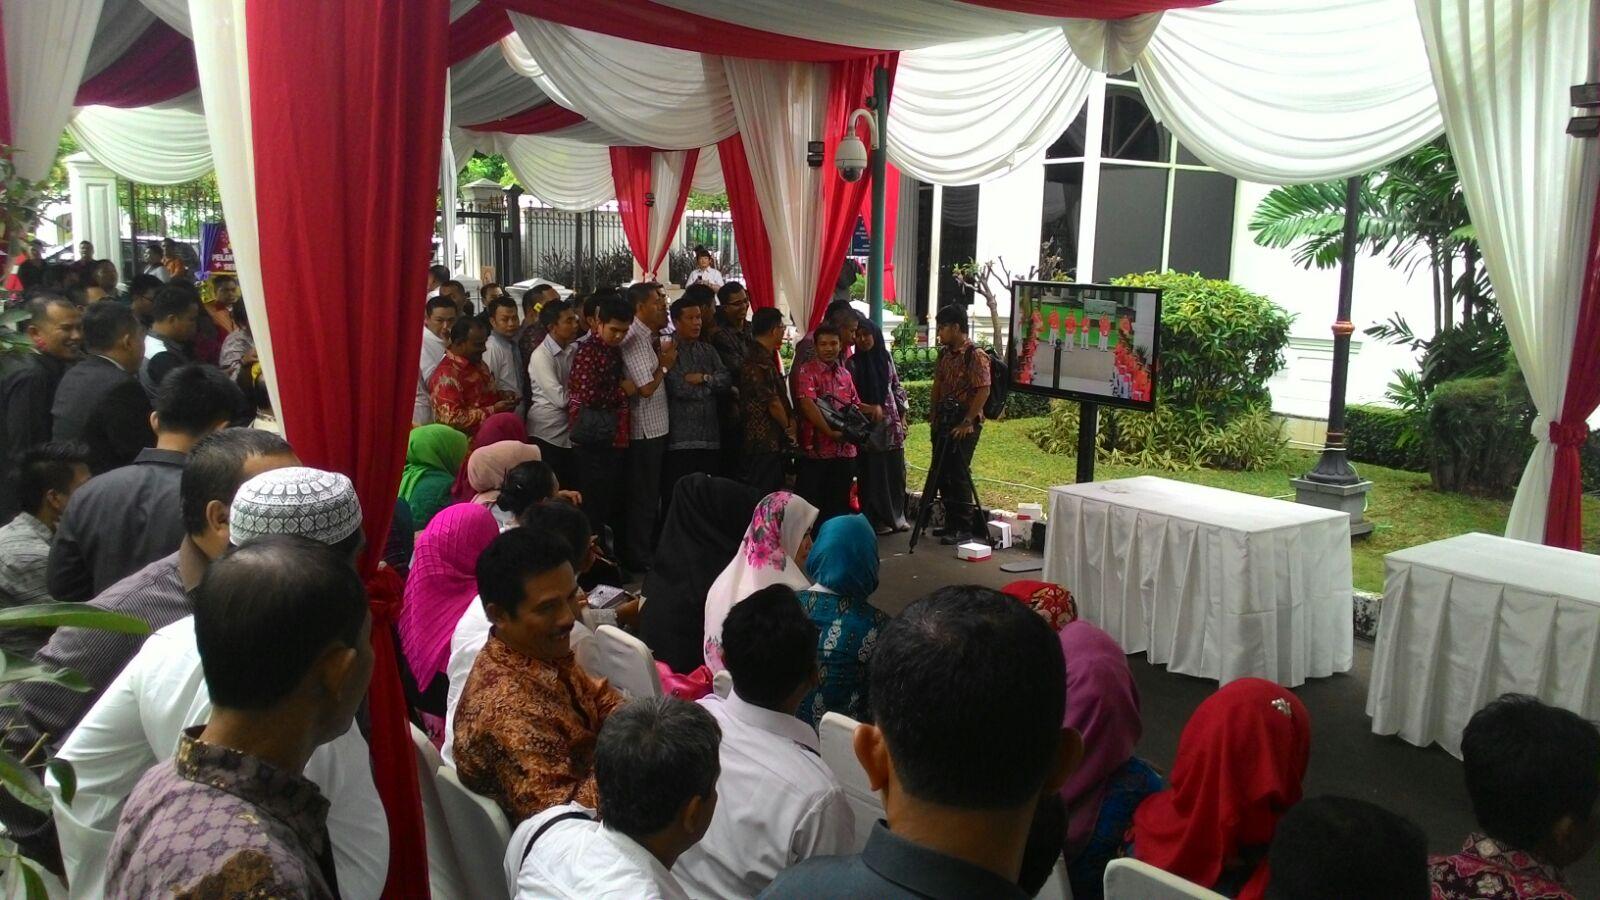 Nobar Pelantikan Gubernur Halaman Istana Negara Jakarta Radar Ala Seru